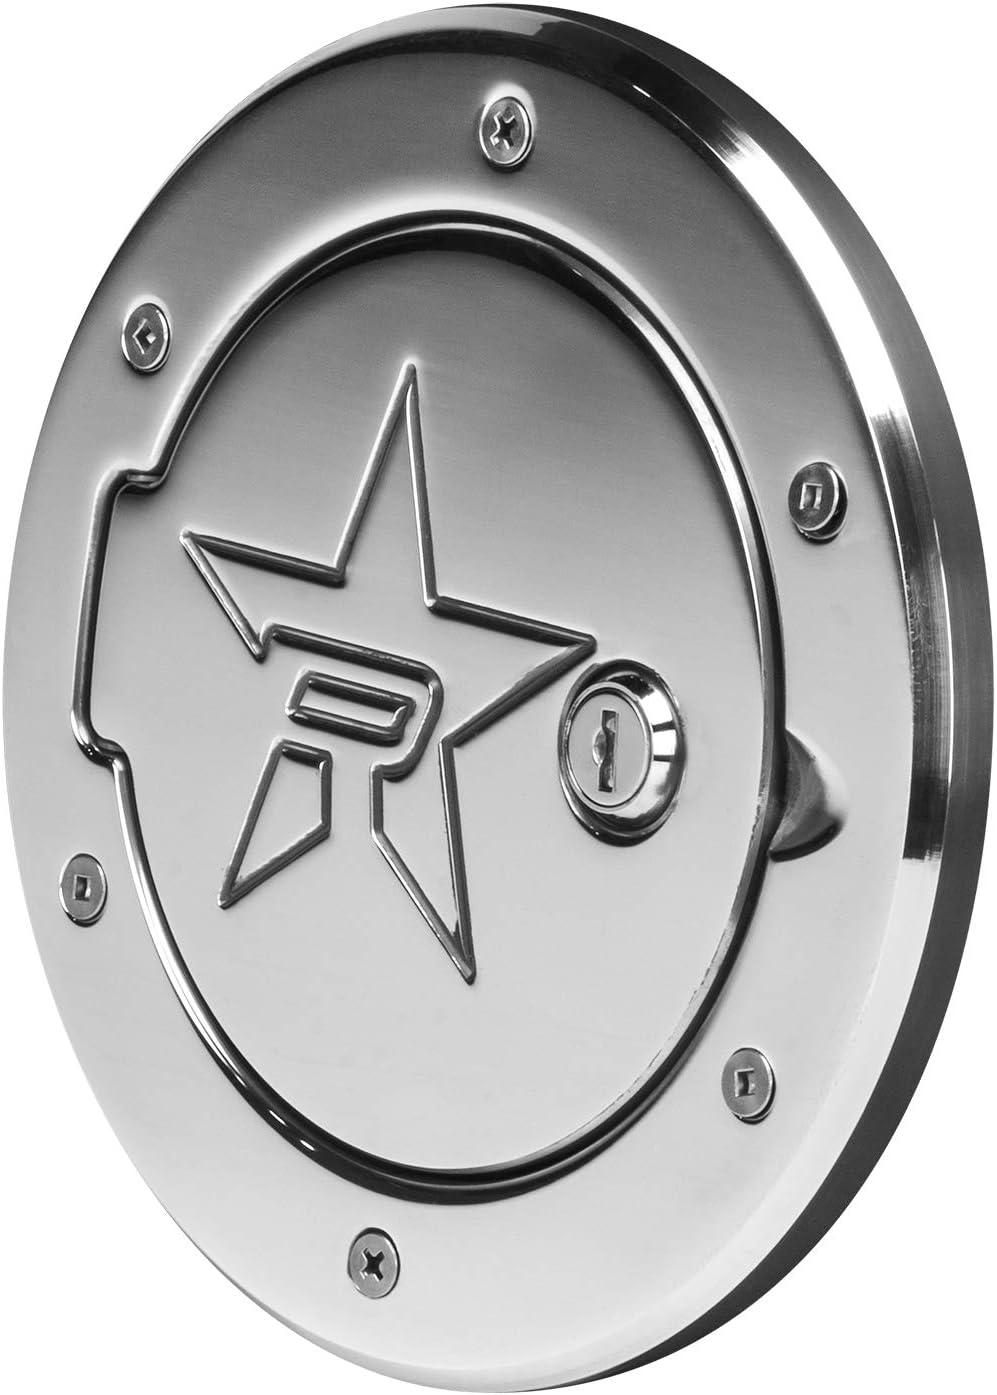 RBP RX-2 Polished Aluminum Locking Fuel Door